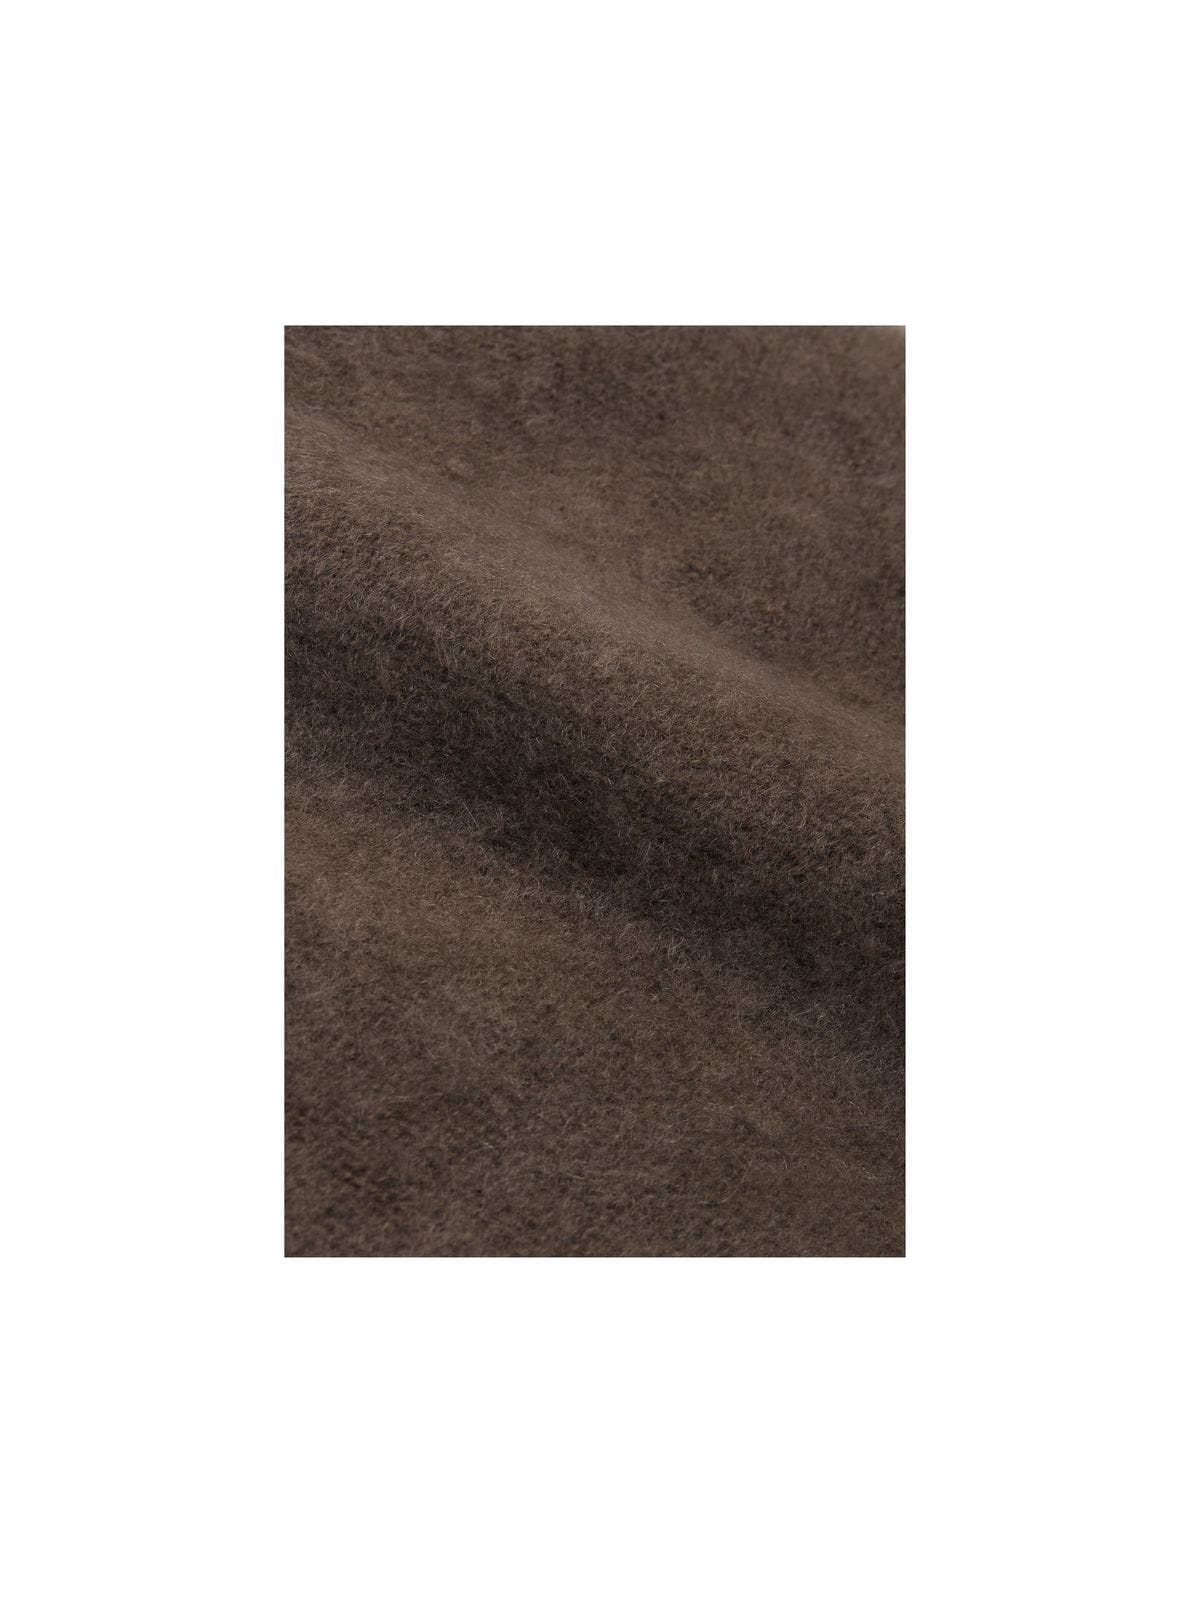 W241-41-Sally Brushed Major Brown_DET_1200x1600